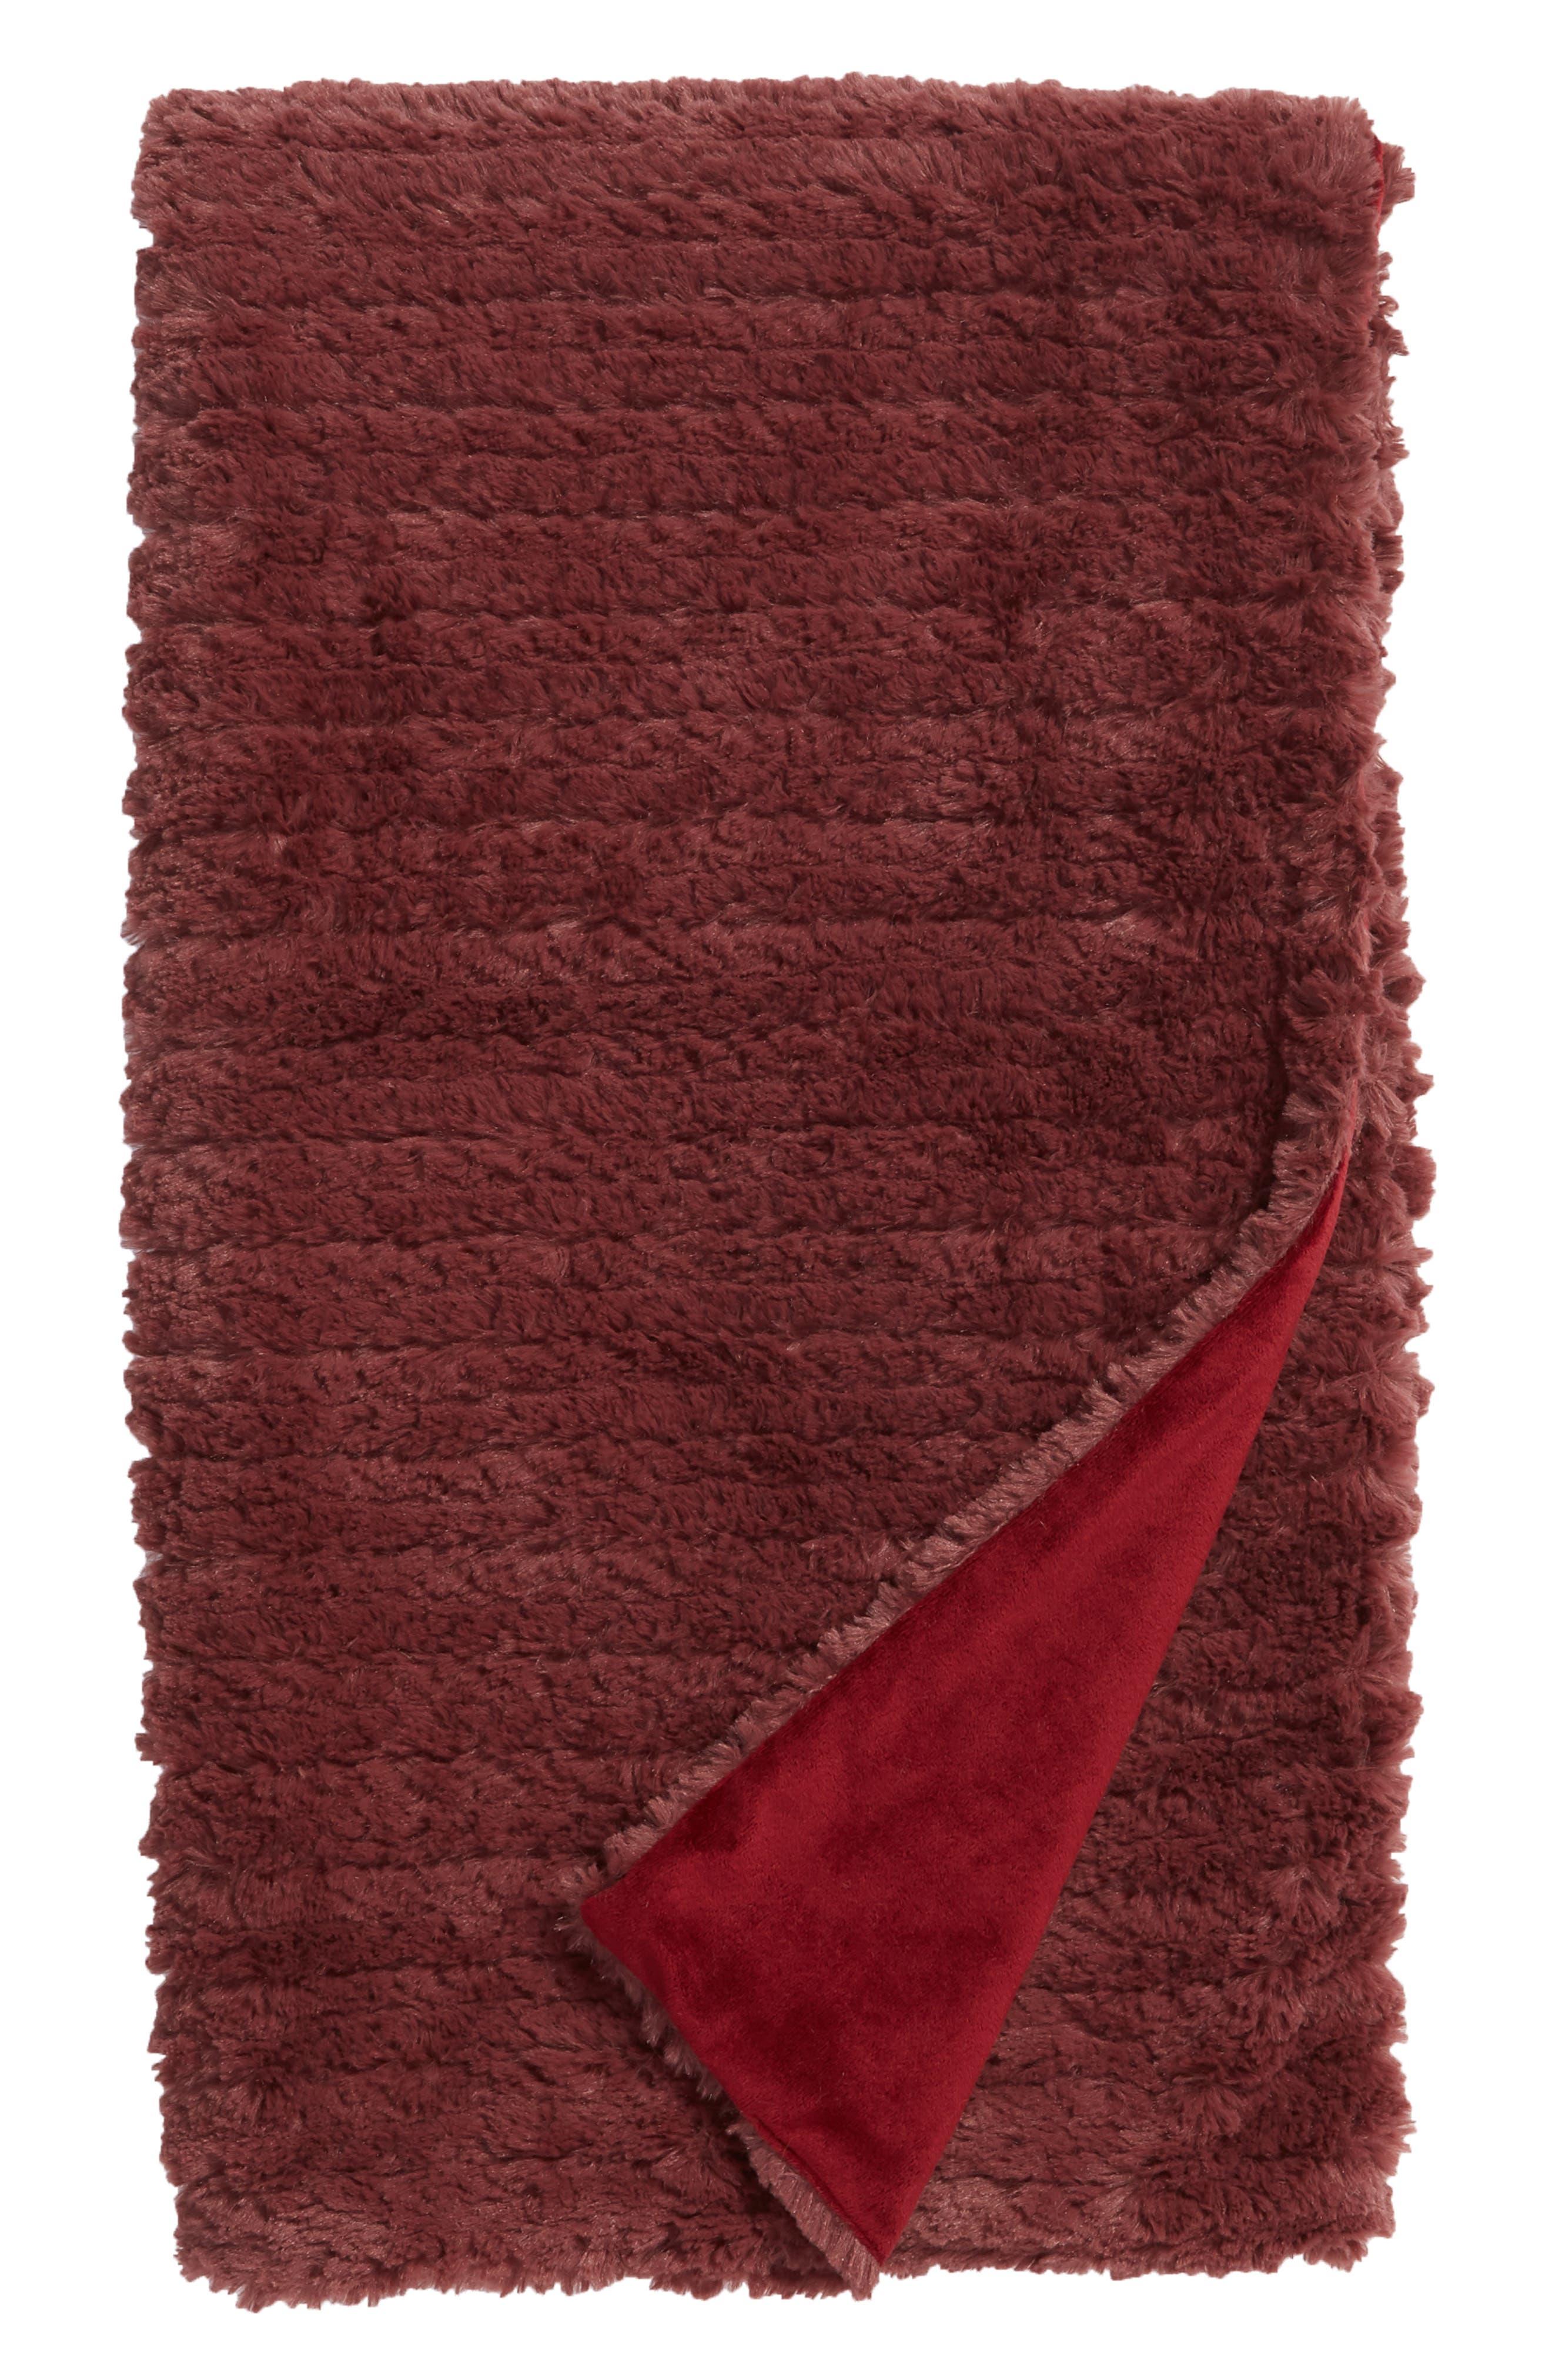 NORDSTROM AT HOME Faux Fur Throw Blanket, Main, color, BURGUNDY GINGER